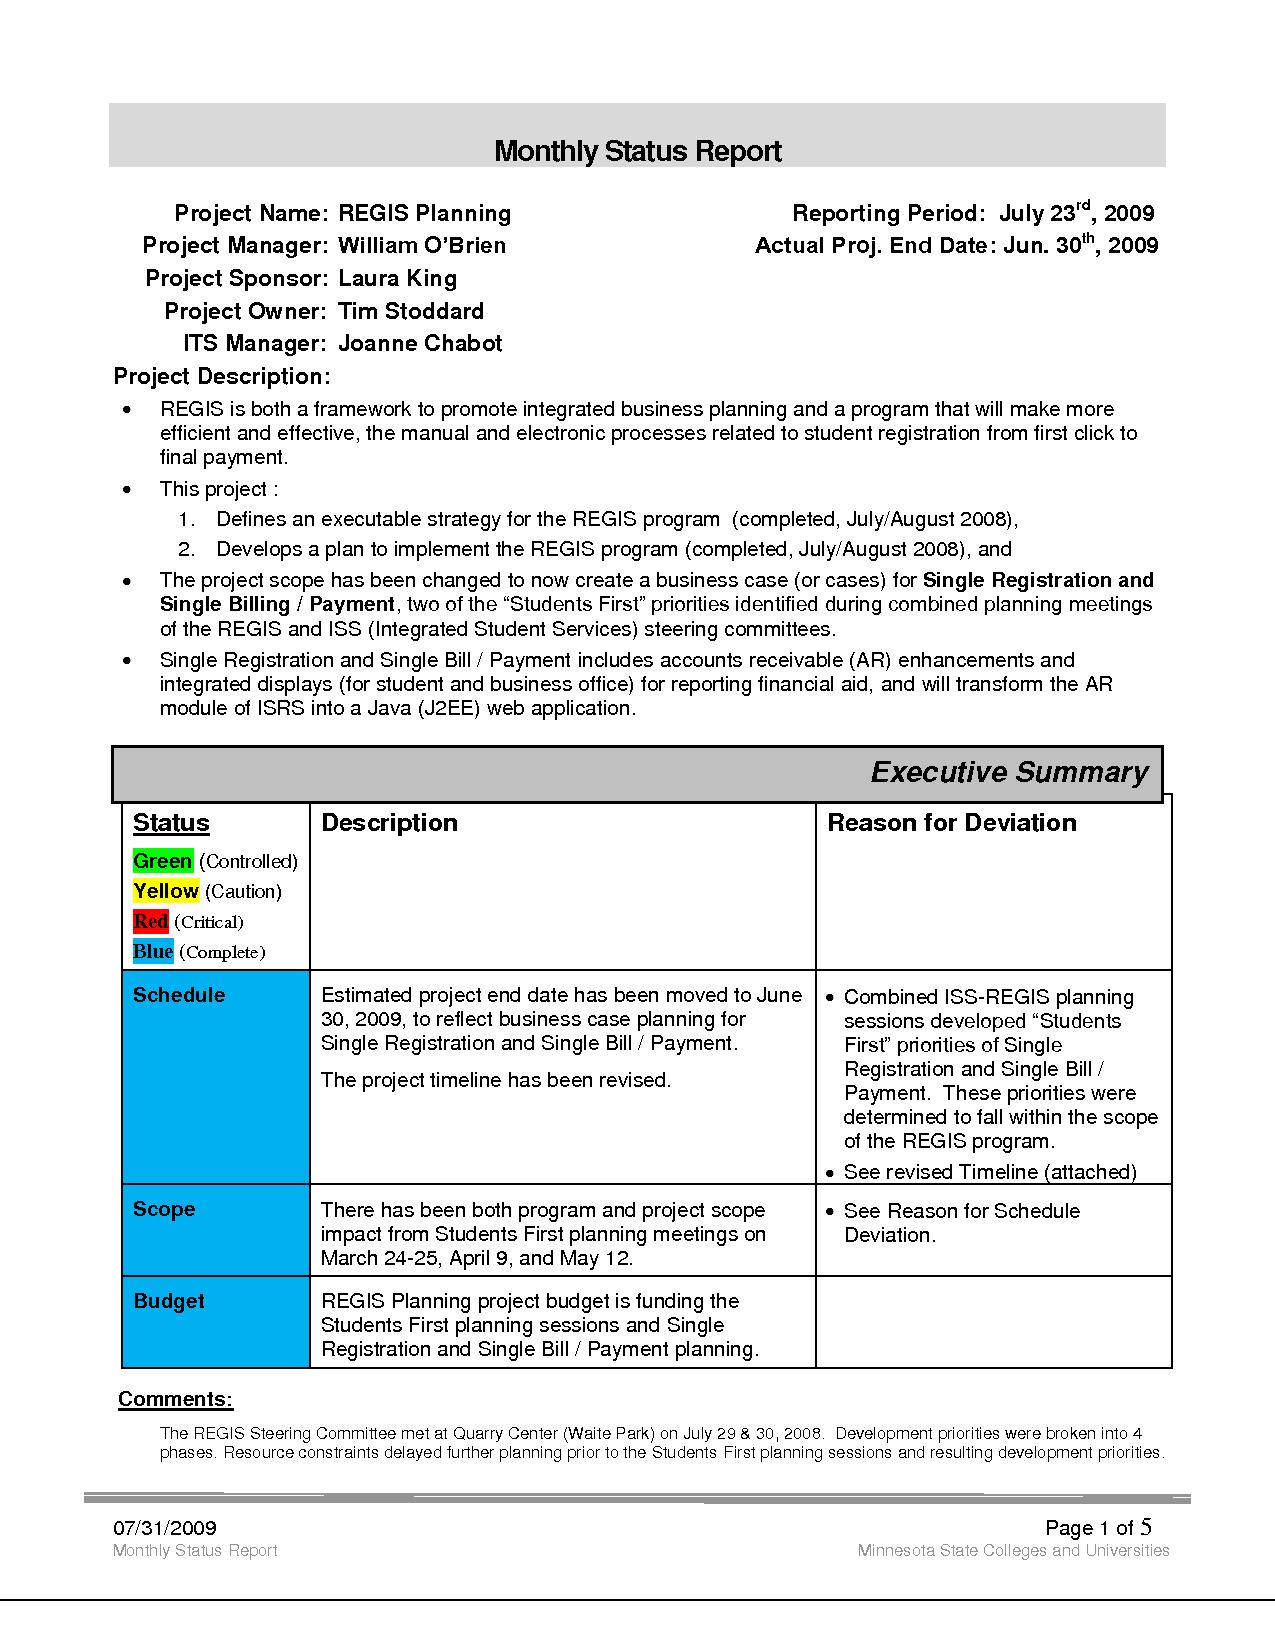 Construction Progress Report Template Excel And Construction Site Report Template